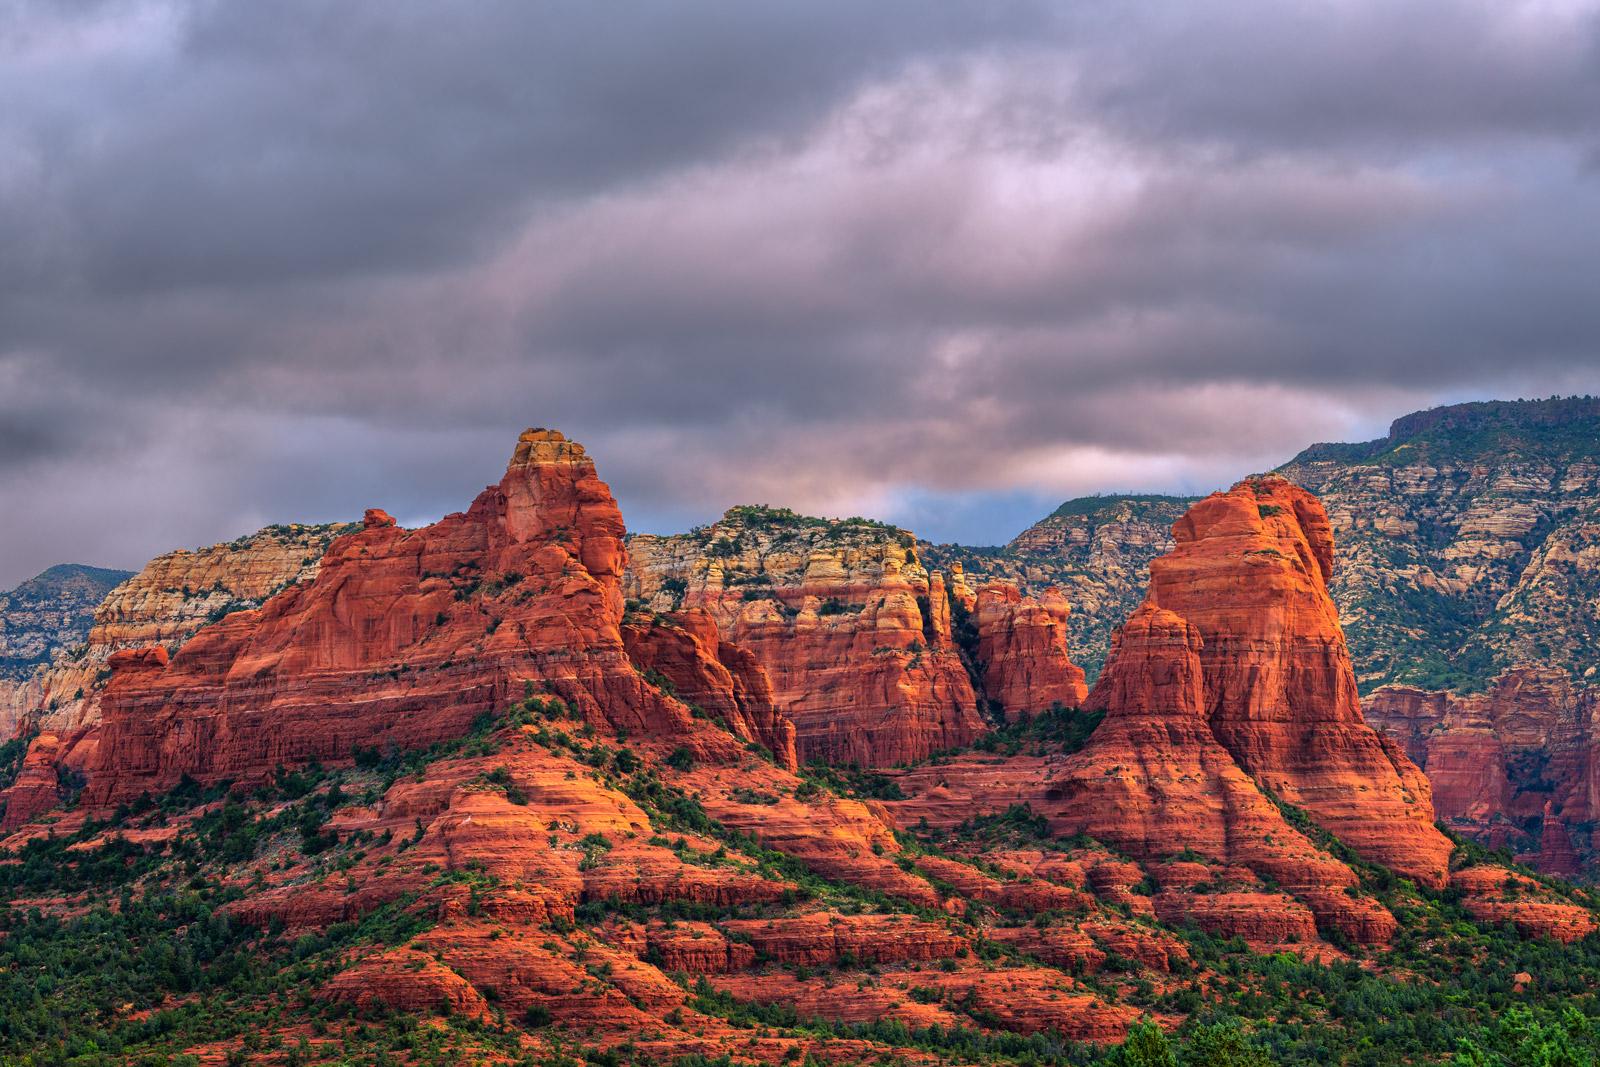 Arizona, Sedona, Sunrise, Red, Rock, dark clouds, red rock, photo